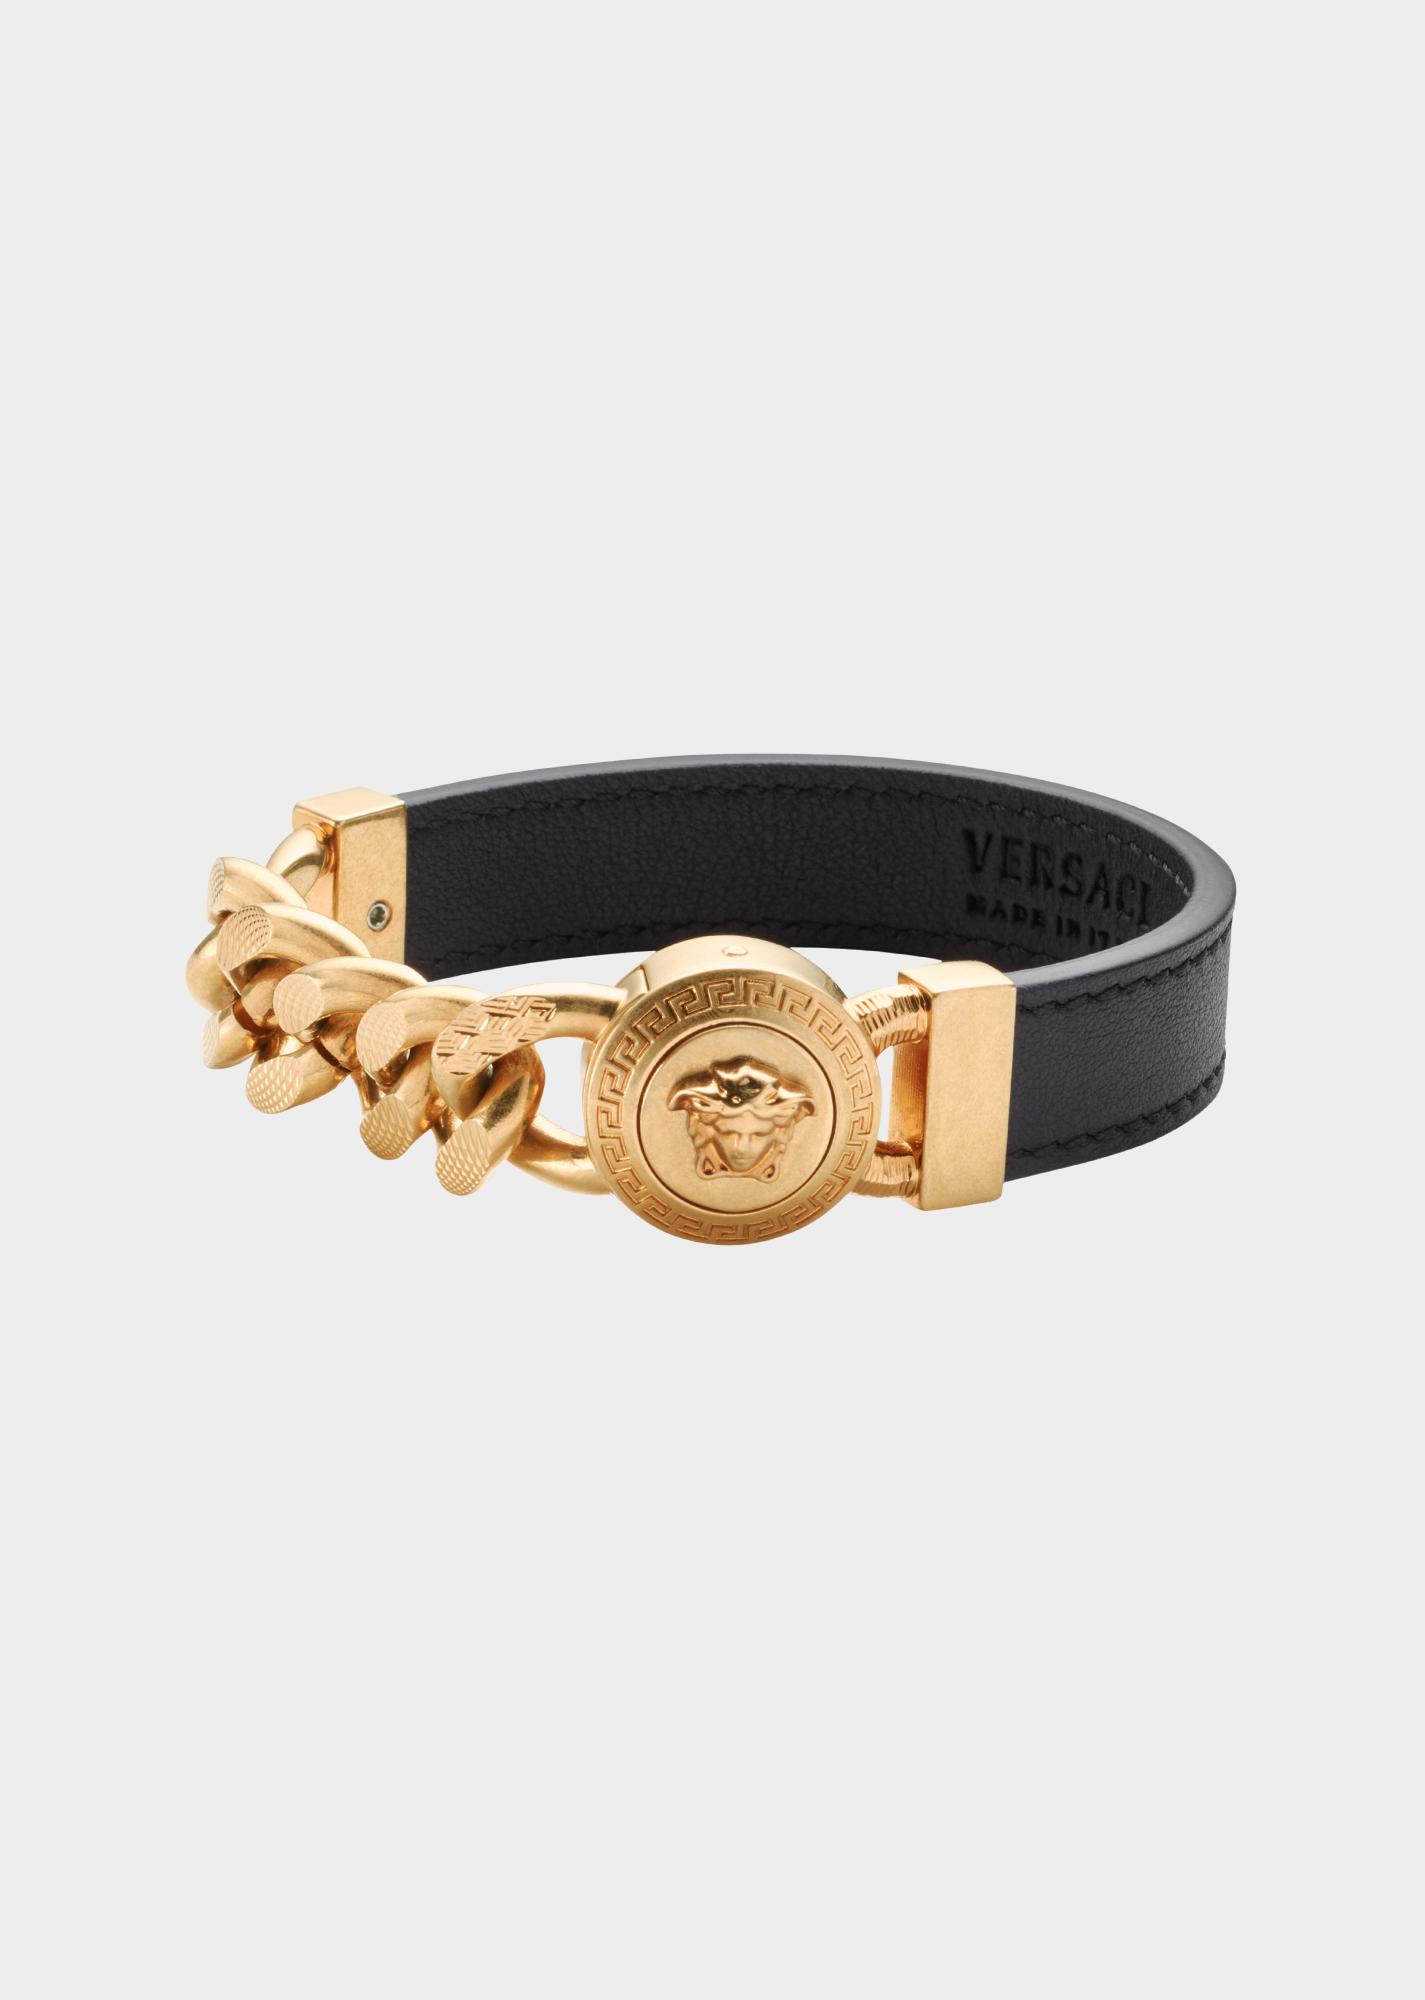 dd8f97df86 Medusa Chain Leather Bracelet for Men | Official Website in 2019 ...